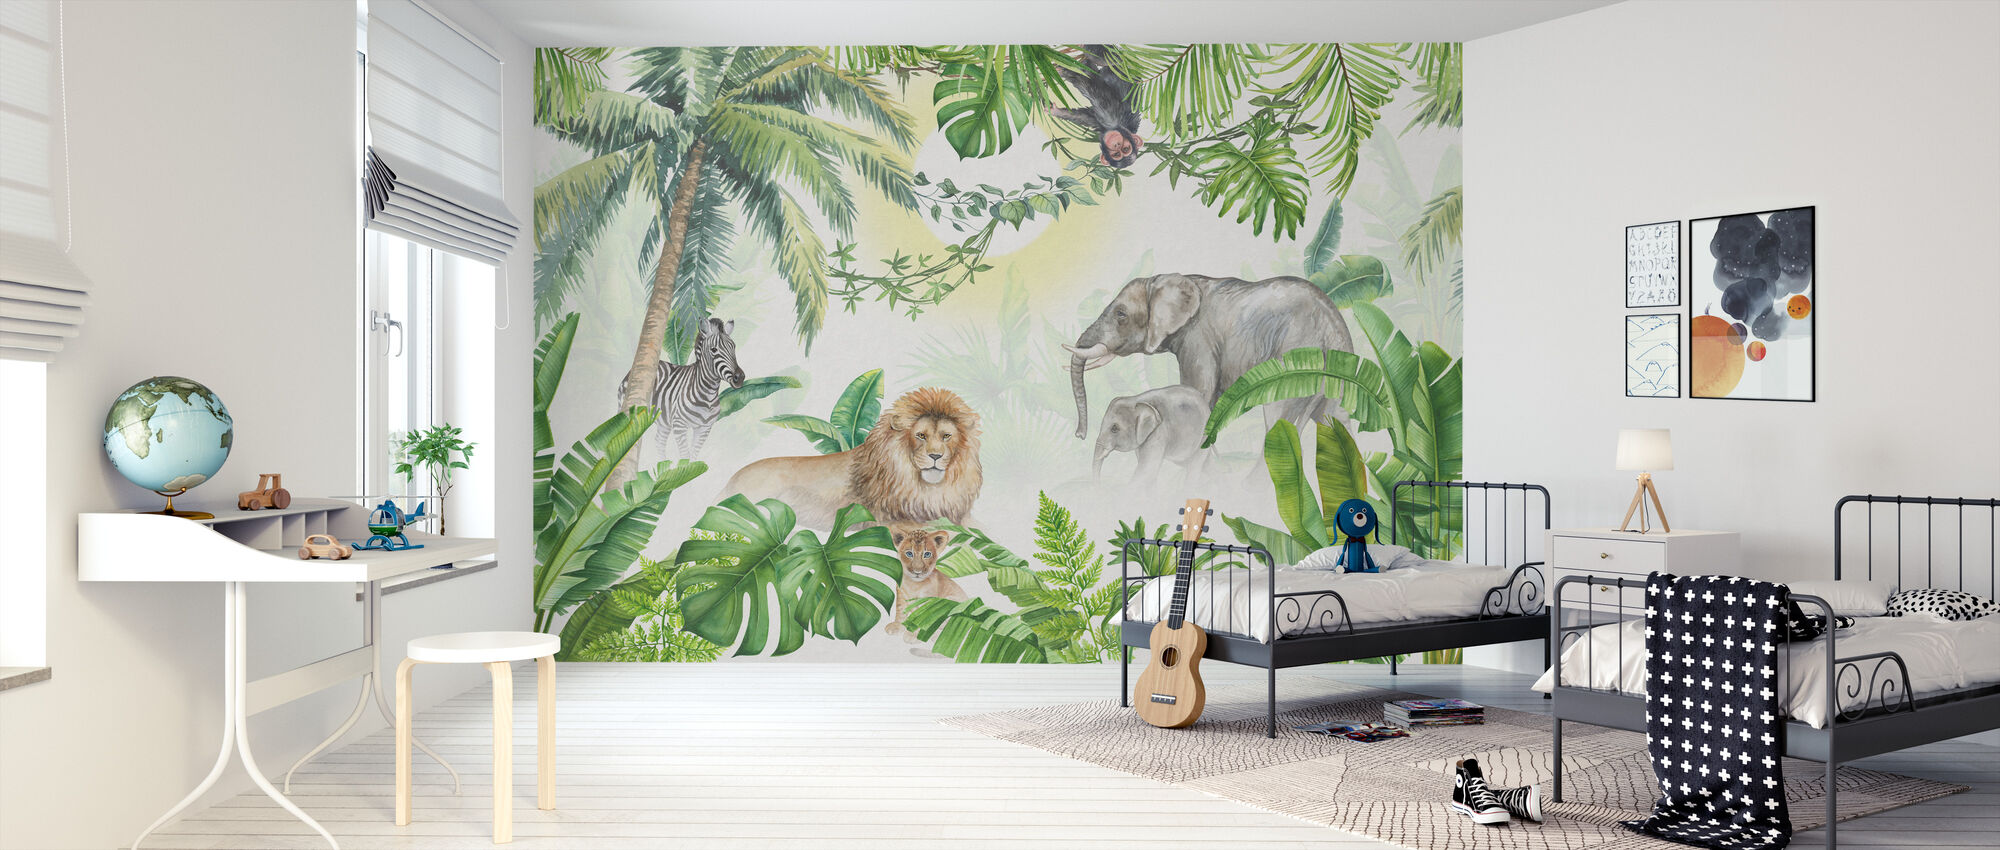 Jungle Animals - Wallpaper - Kids Room